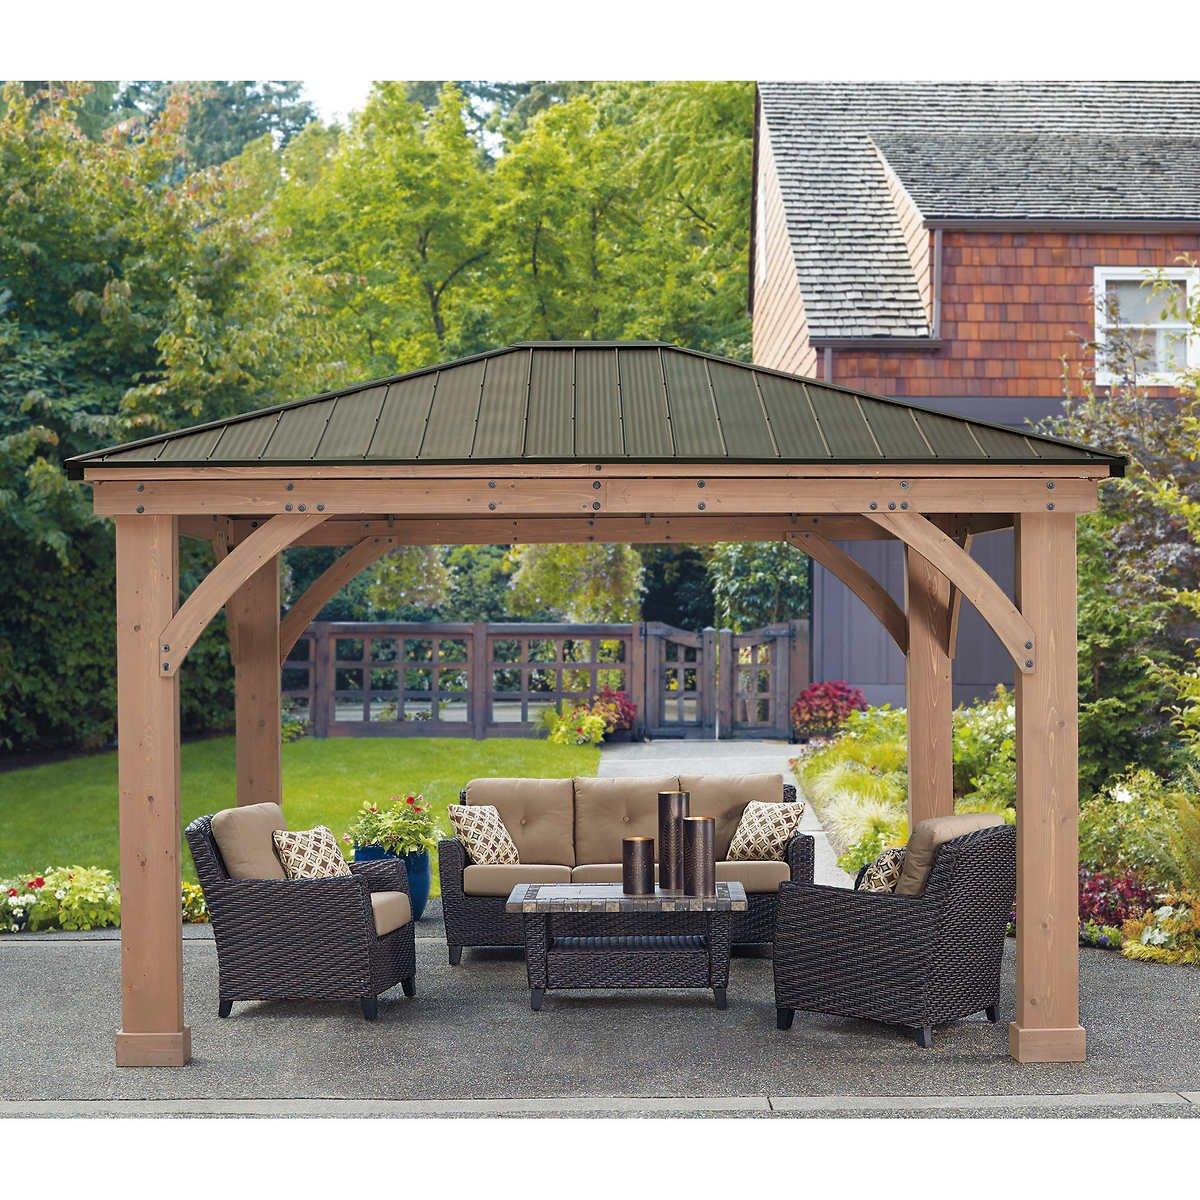 Amazon.com : 12' x 14' Cedar Gazebo With Aluminum Roof : Garden & Outdoor - Amazon.com : 12' X 14' Cedar Gazebo With Aluminum Roof : Garden